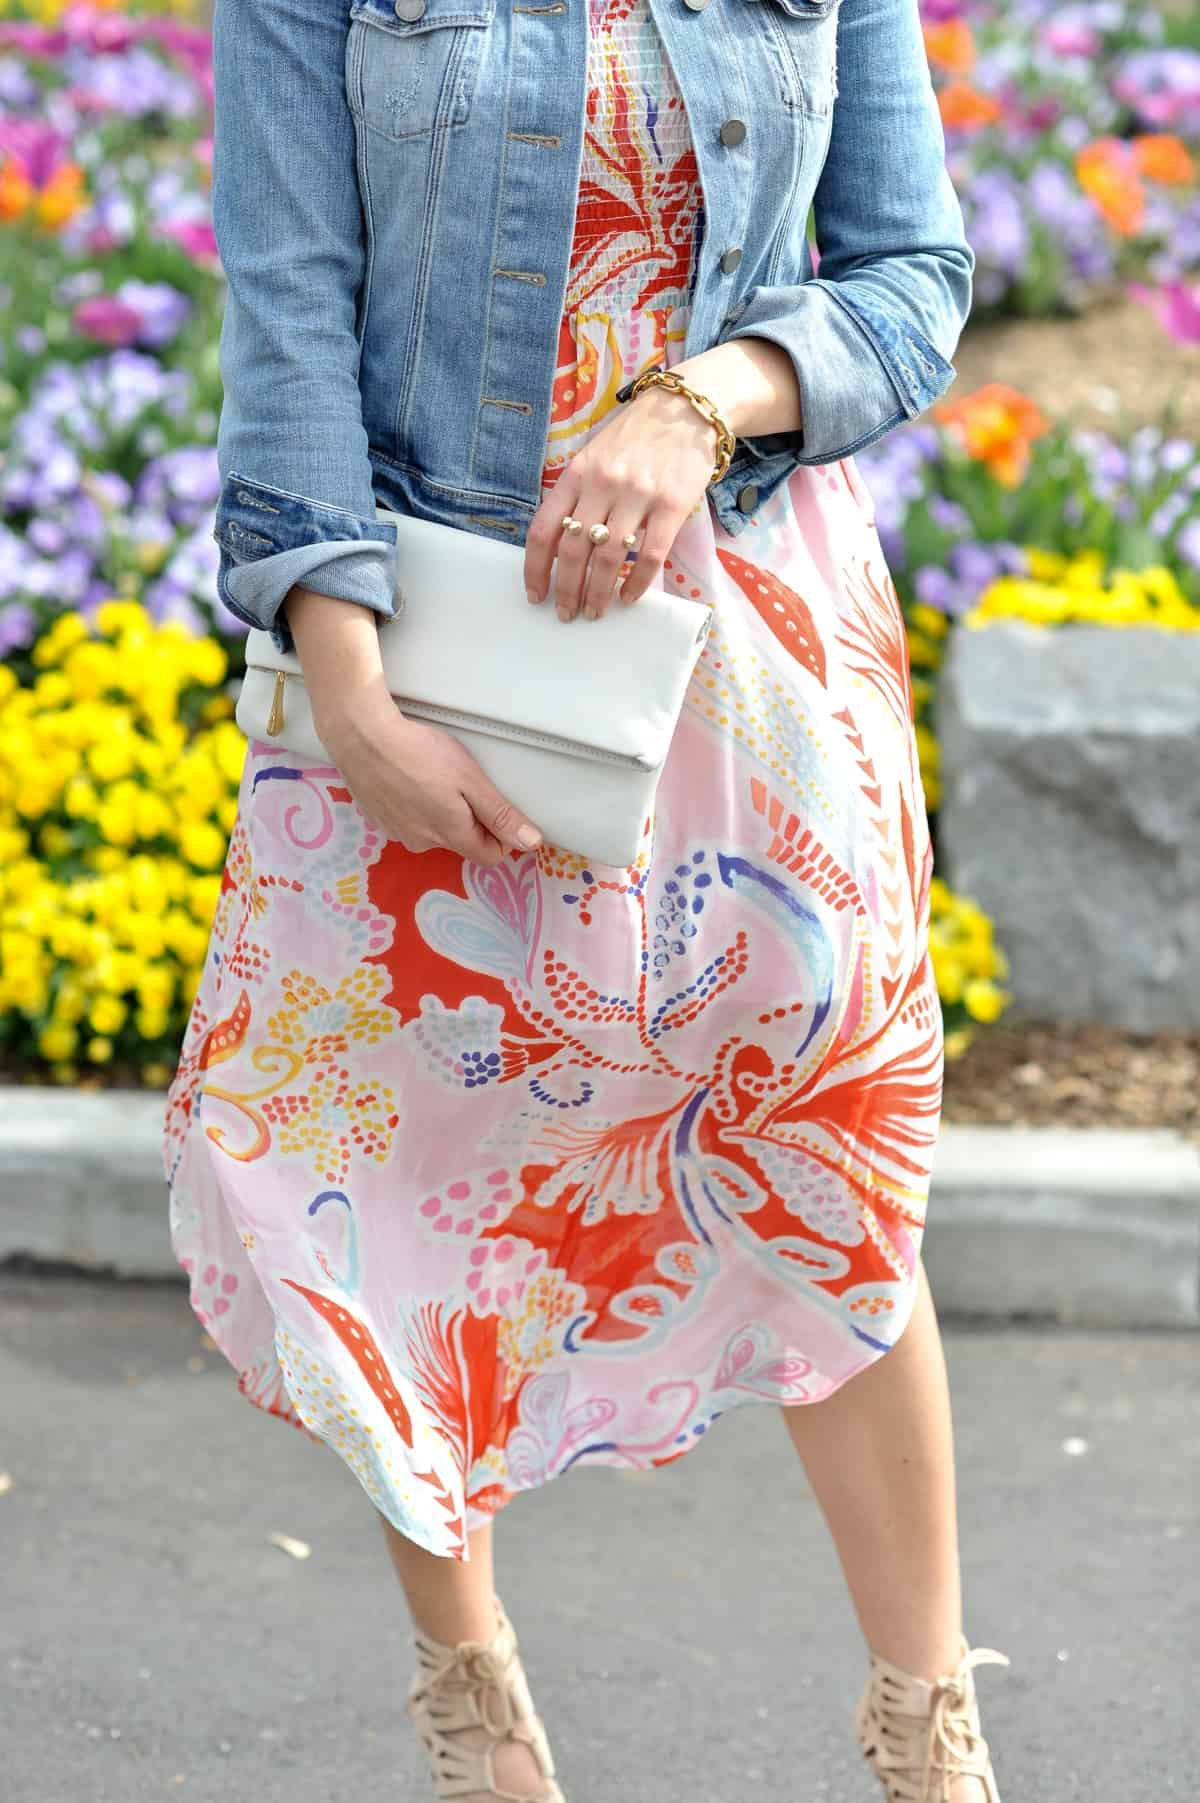 Banjanan Cochella Dress - printed floral dress for summer - My Style Vita - @mystylevita - 20